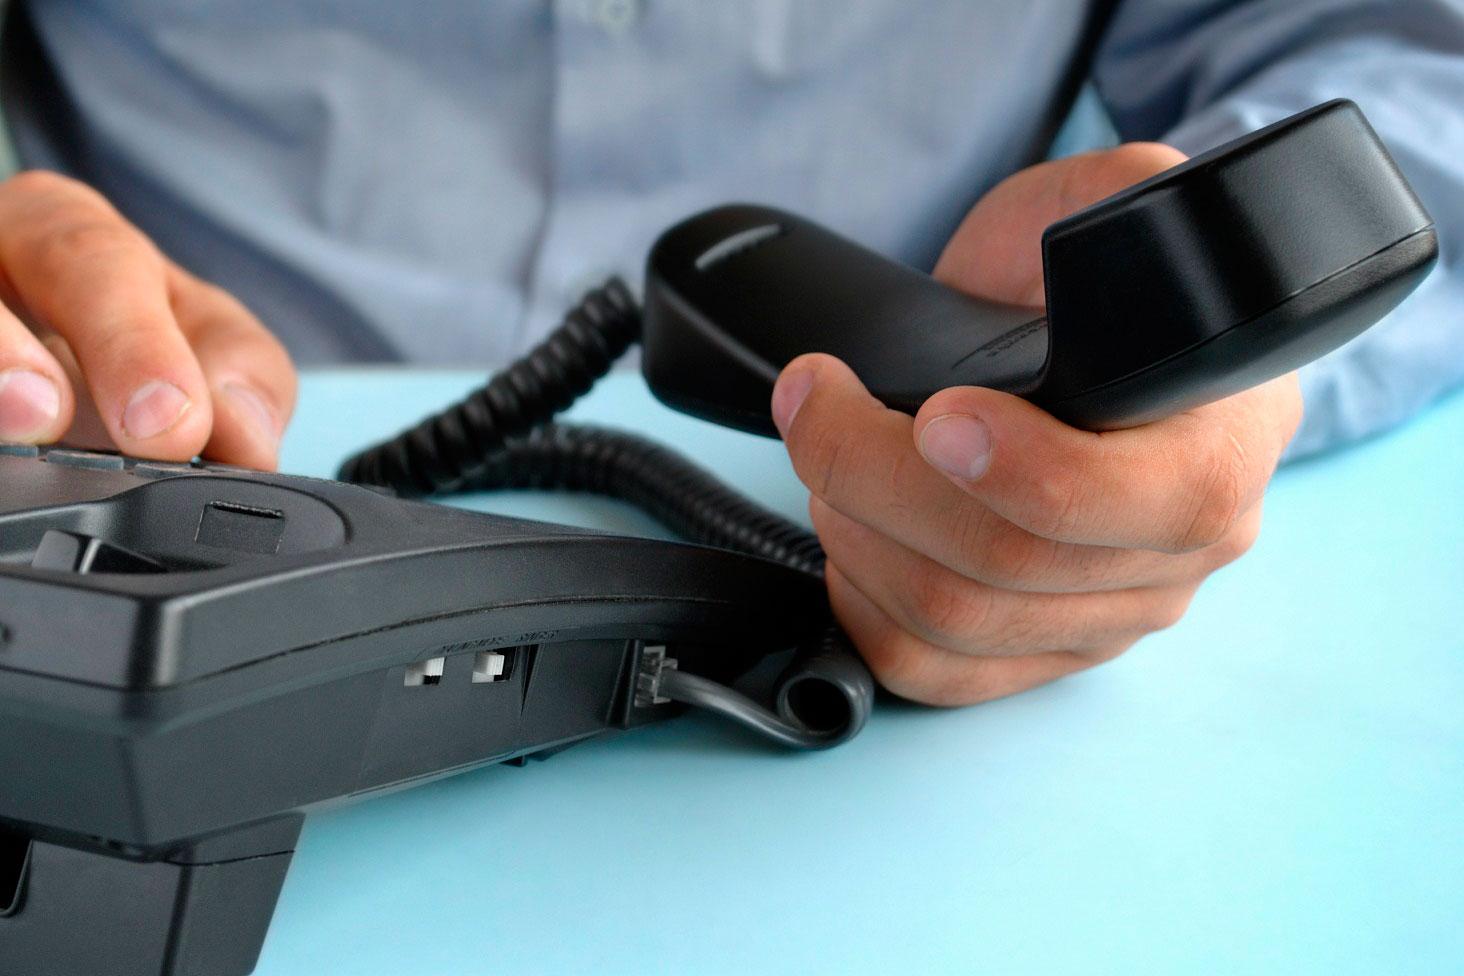 servicos-telecomunicacao-telecomunicacoes-telefonia-cancelamento-telefone-na-mao